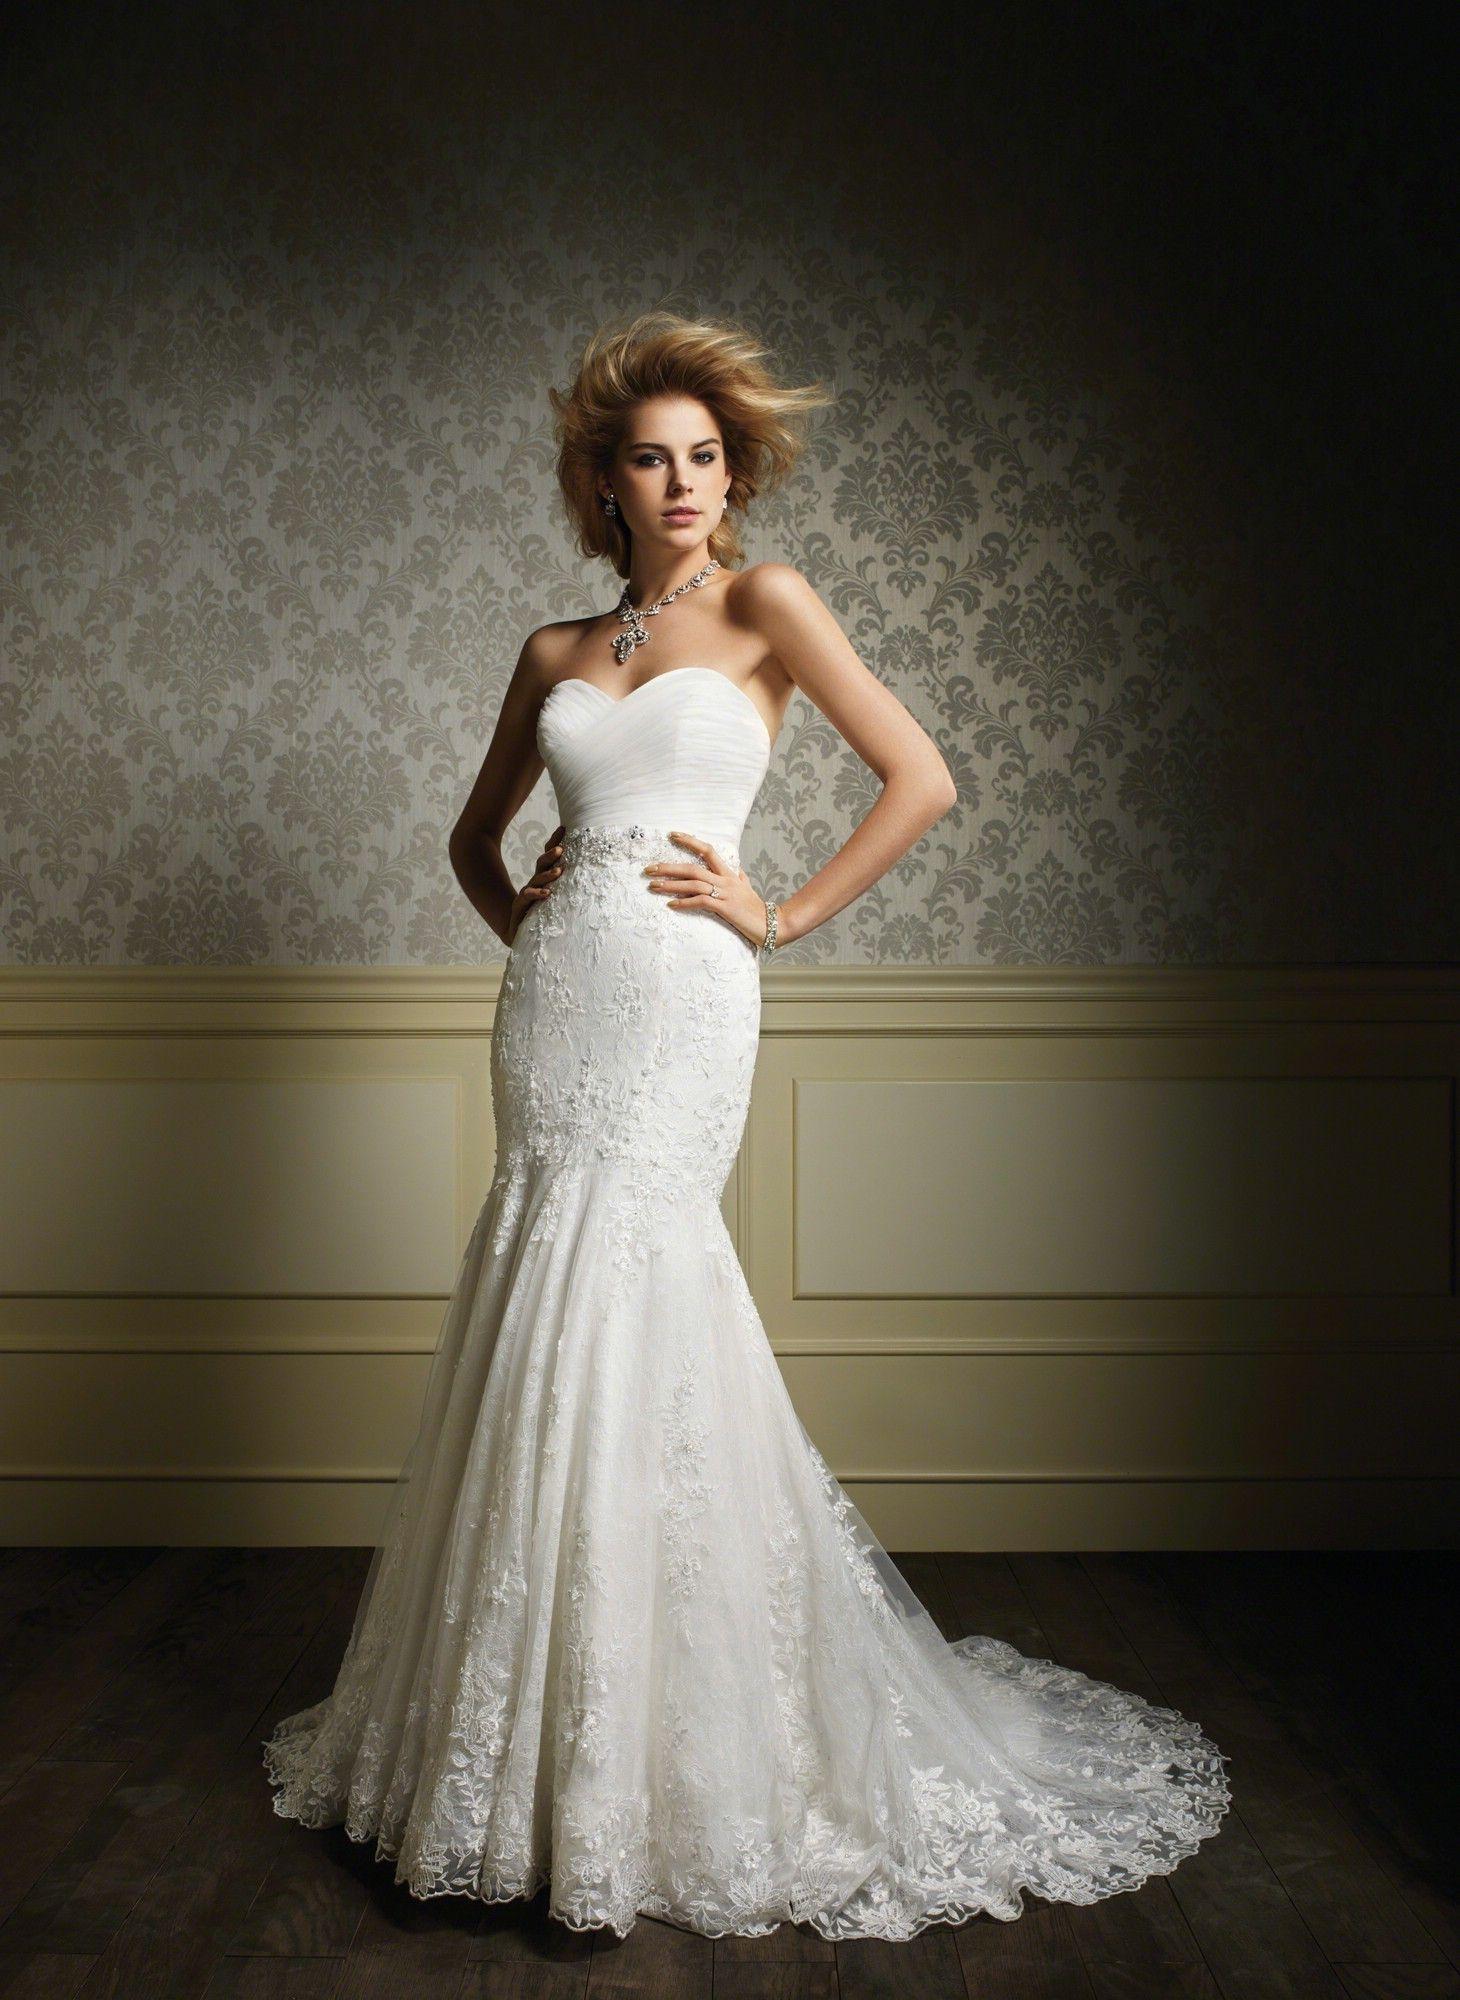 033682f9b2 Super sexy bridal silhouette ... Alfred Angelo Sapphire Wedding Dresses -  Style 887/887NB #alfredangelo #weddingdresses #vintagewedding